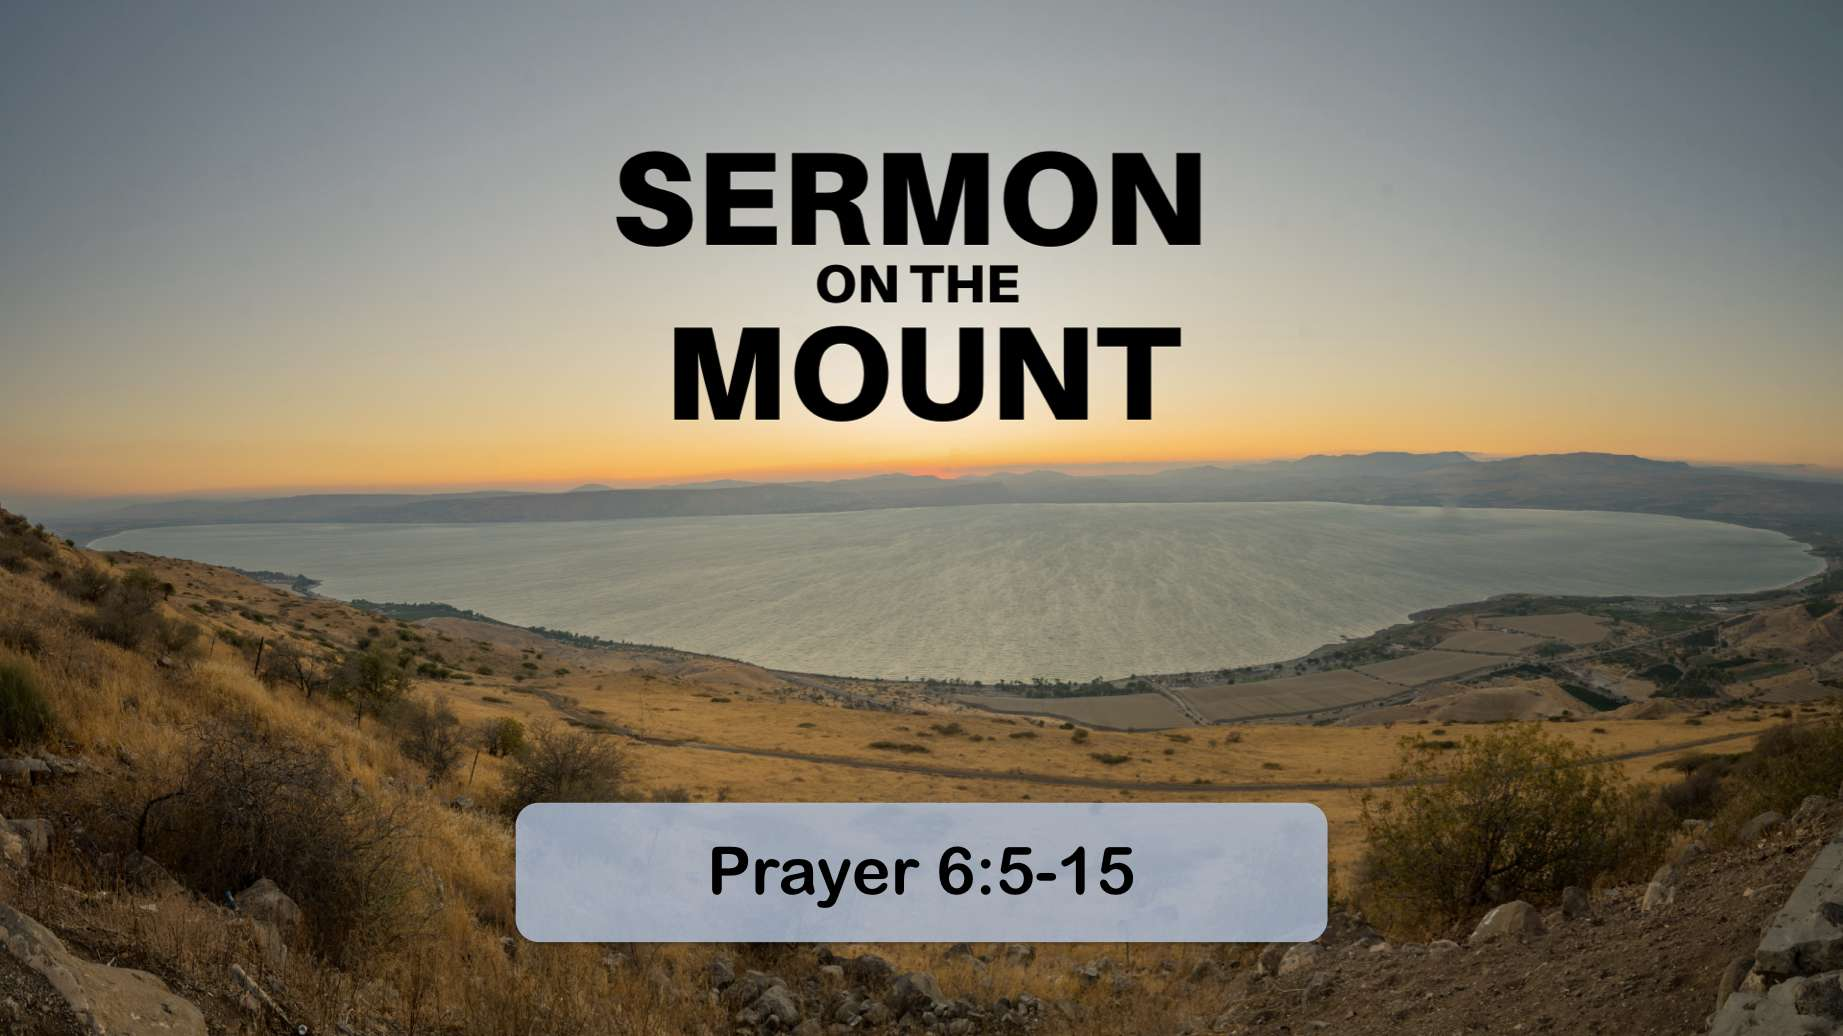 The Sermon on the Mount 9 – Prayer